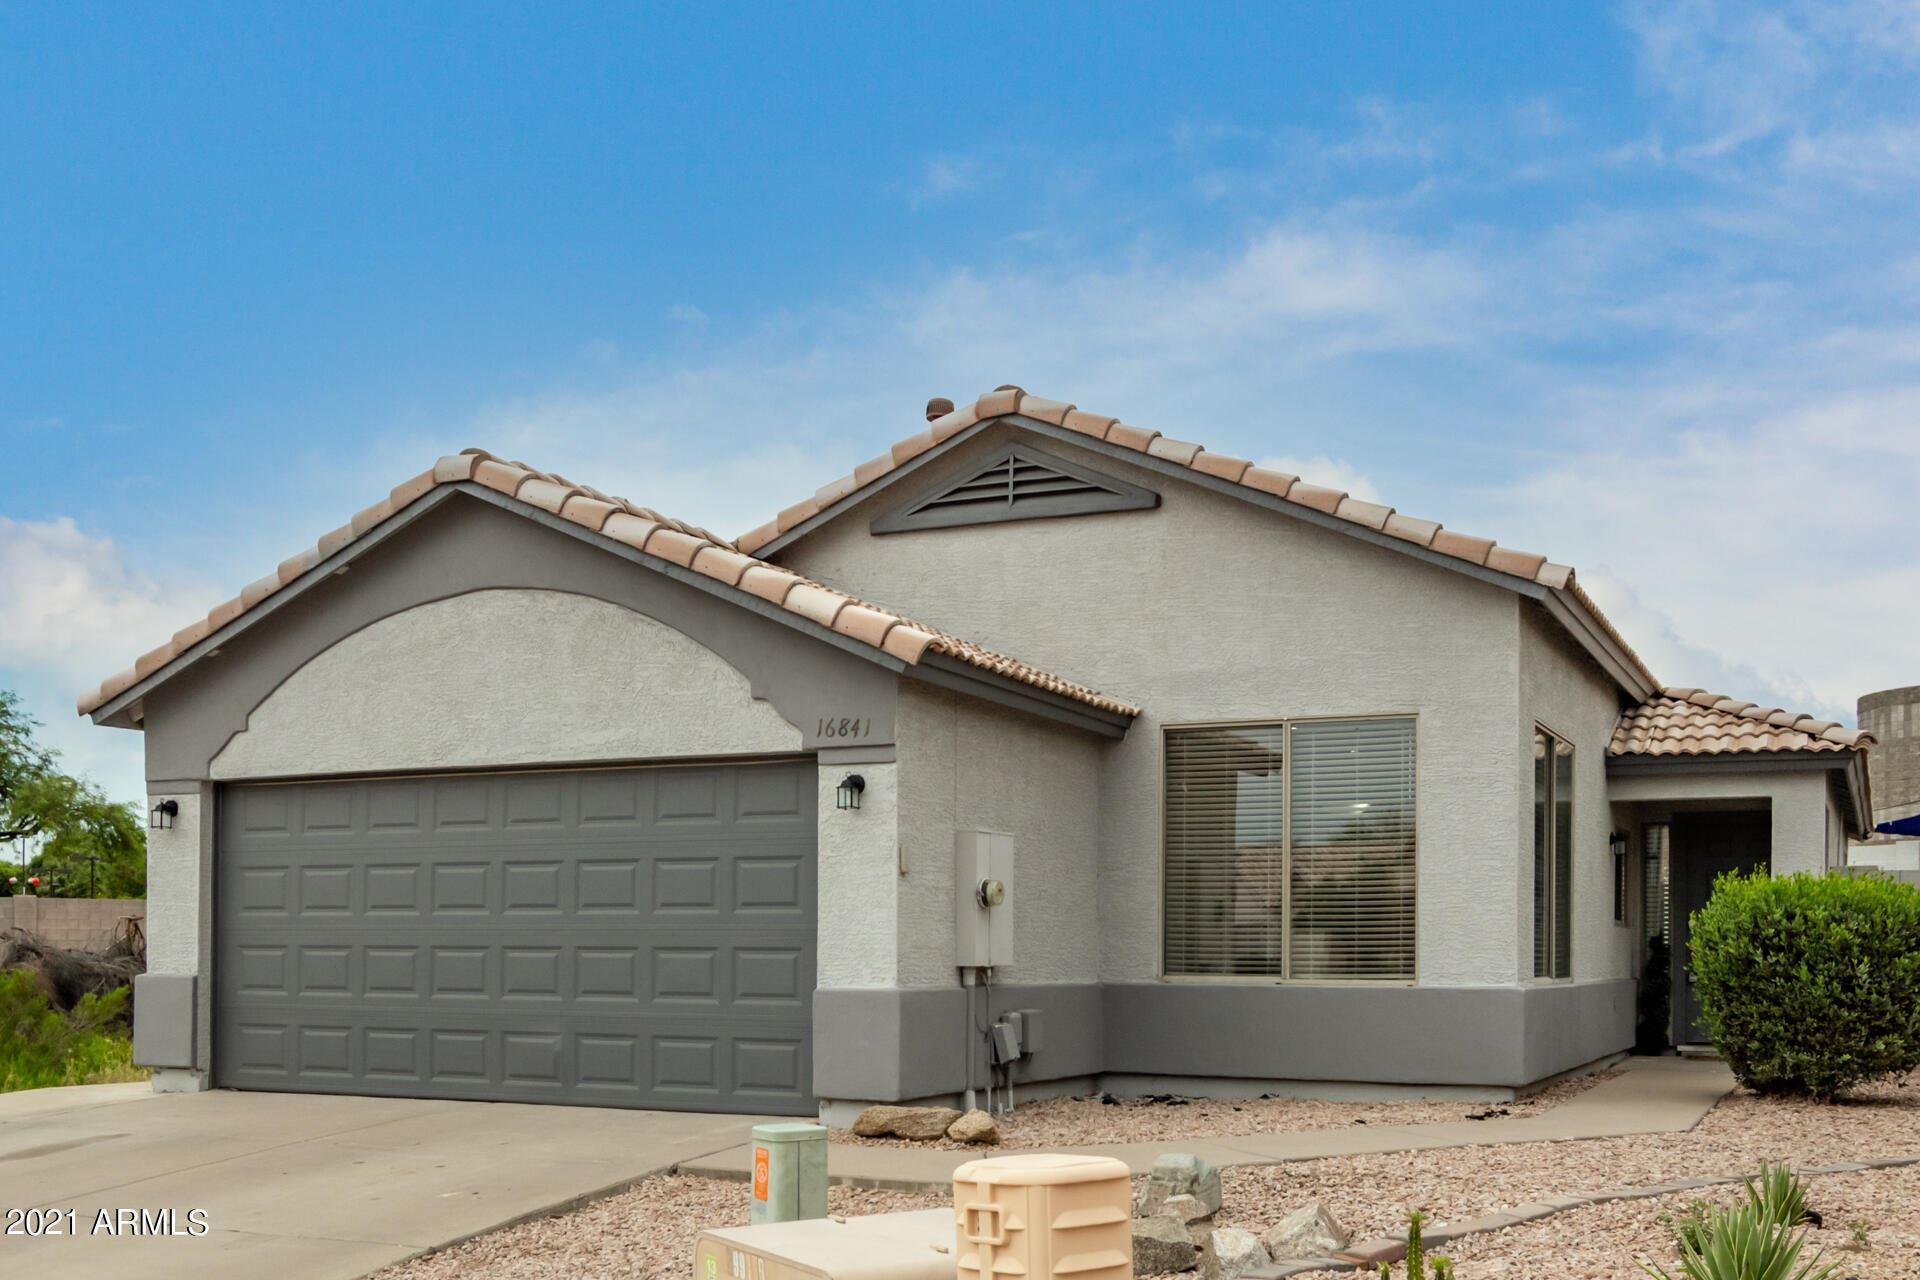 16841 N 18th Place, Phoenix, AZ 85022 - MLS#: 6298802